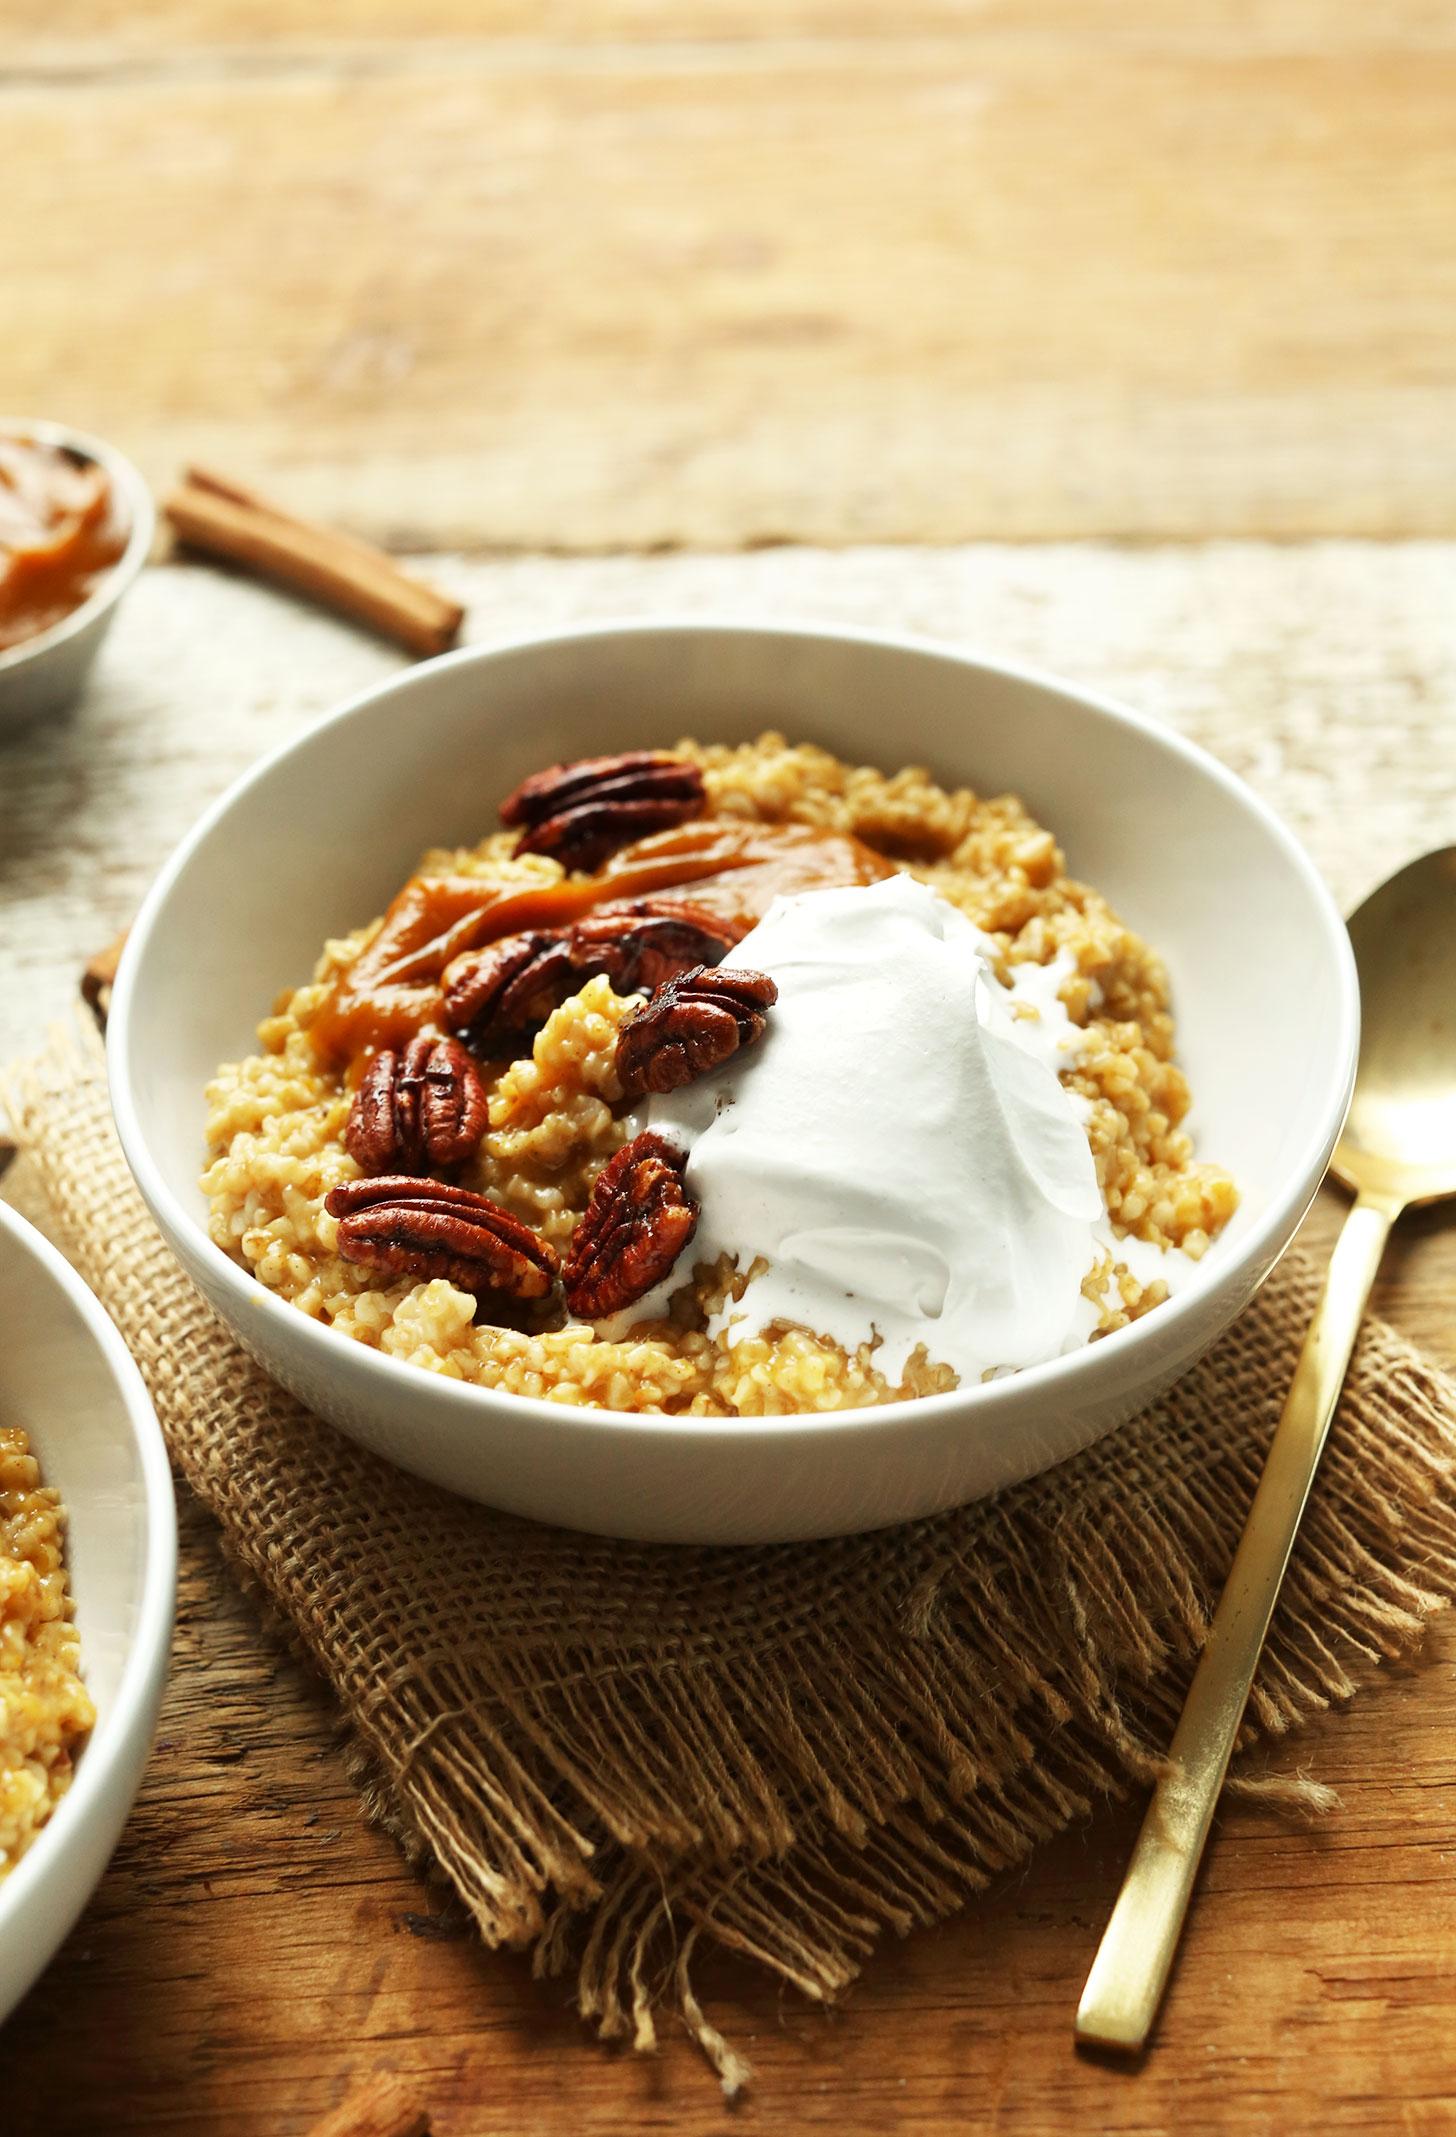 naturally-sweetened-30-minute-pumpkin-pie-oats-the-perfect-indulgent-yet-healthy-fall-breakfast-vegan-glutenfree-recipe-breakfast-pumpkin-fall